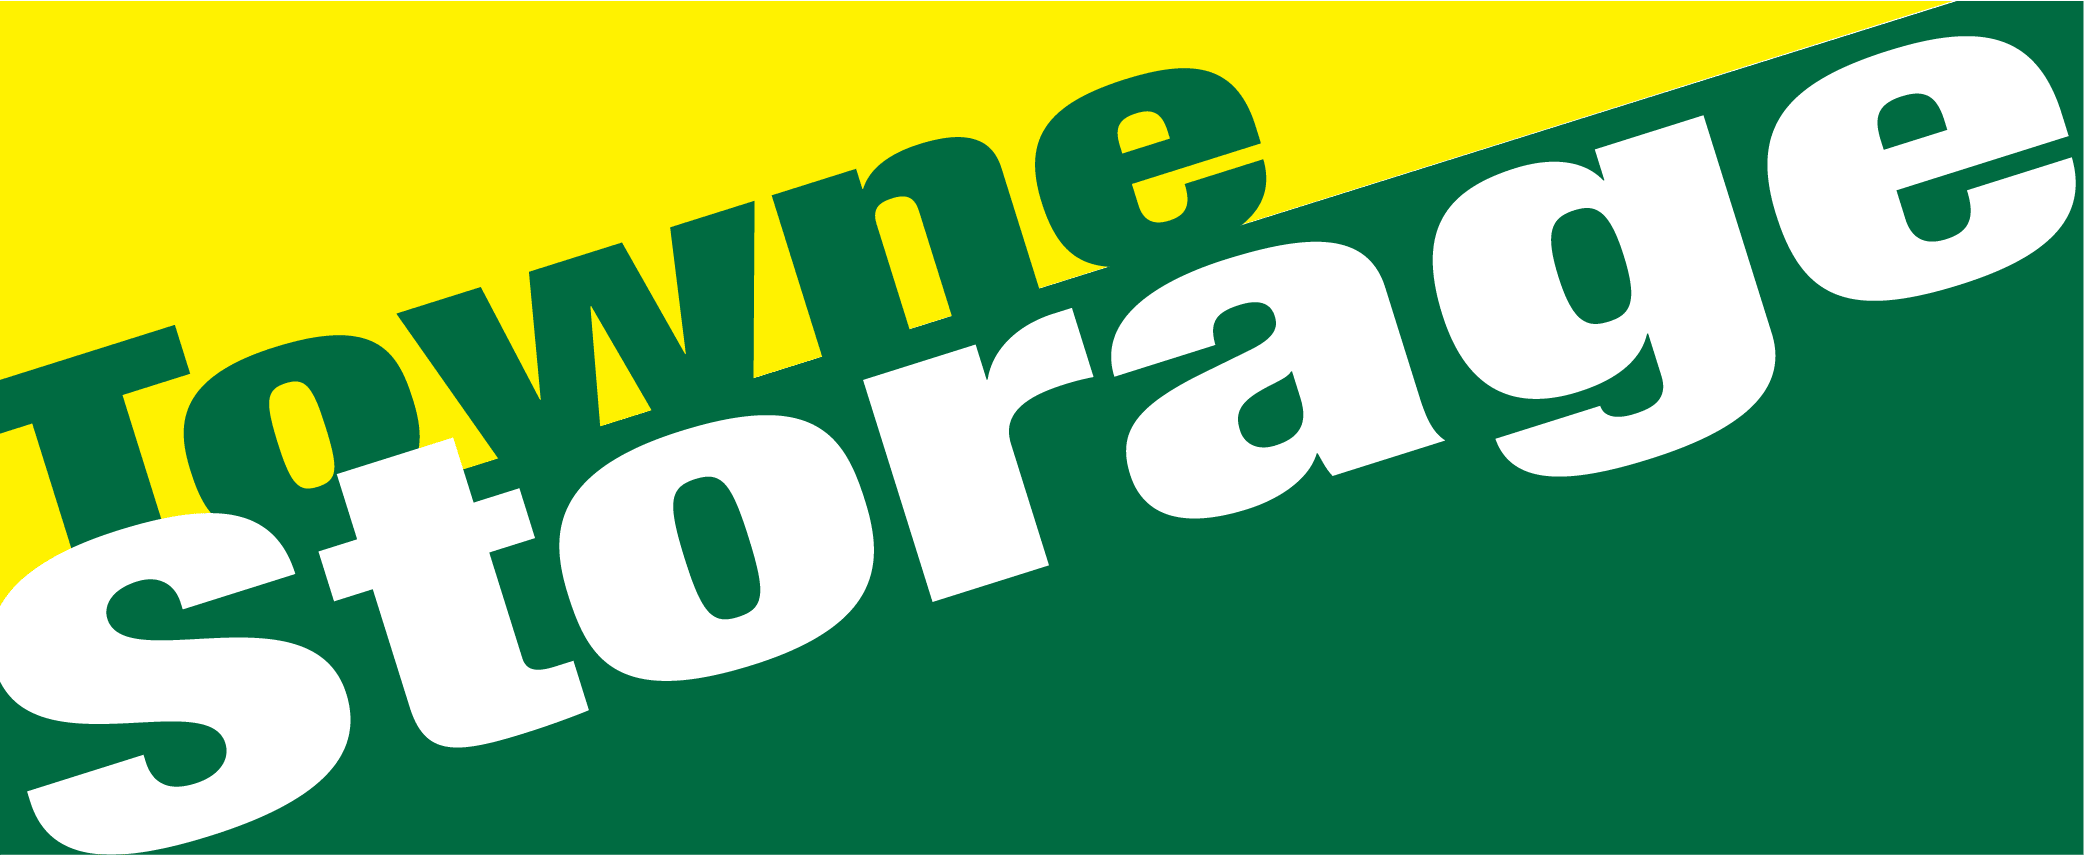 Towne Storage - South Jordan logo